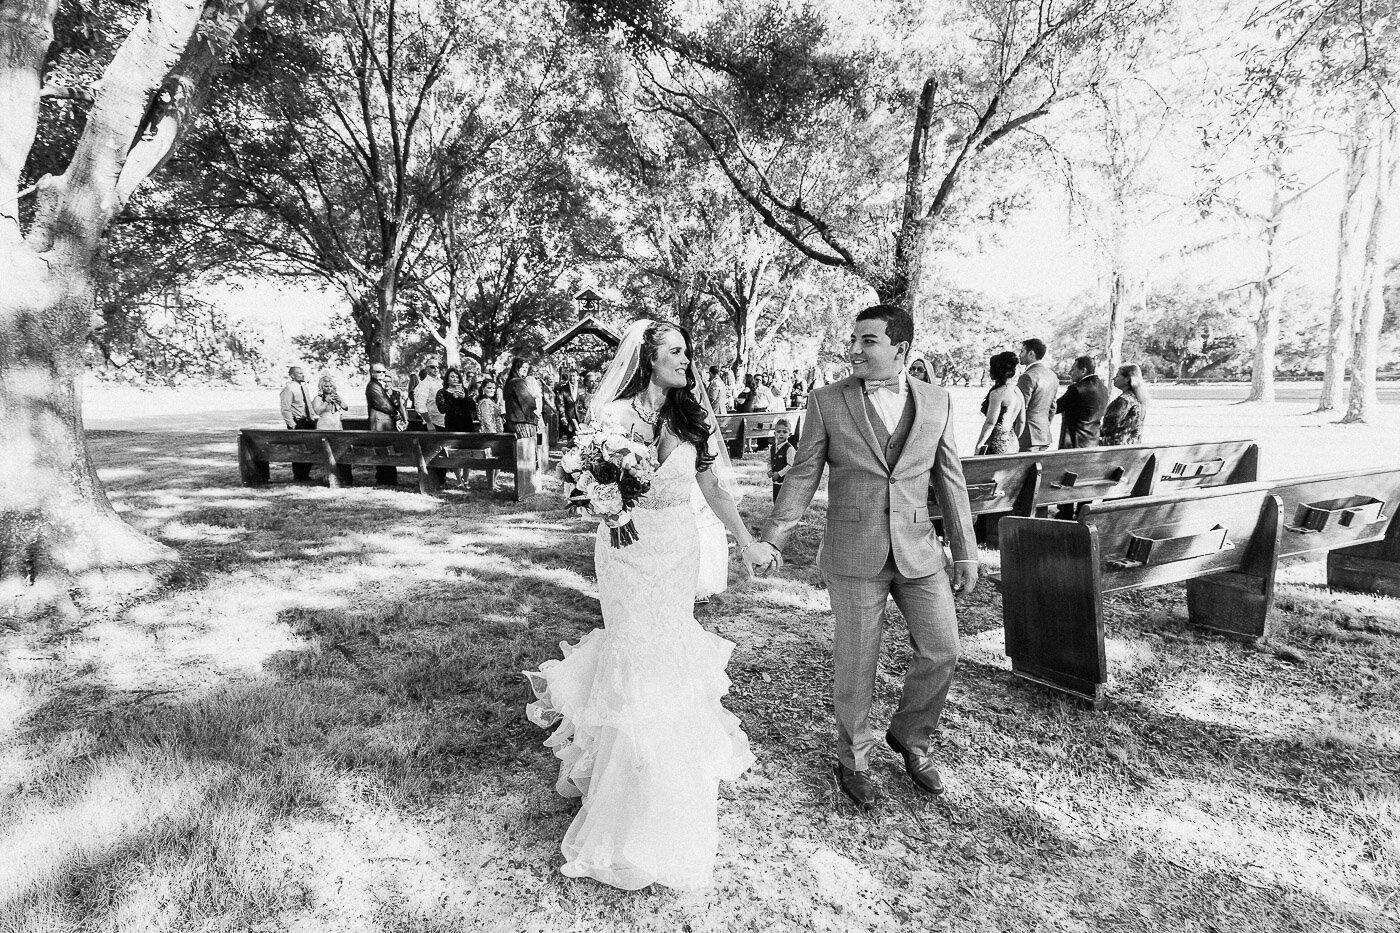 Lakeland-barn-wedding-at-white-horse-ranch-49.jpg